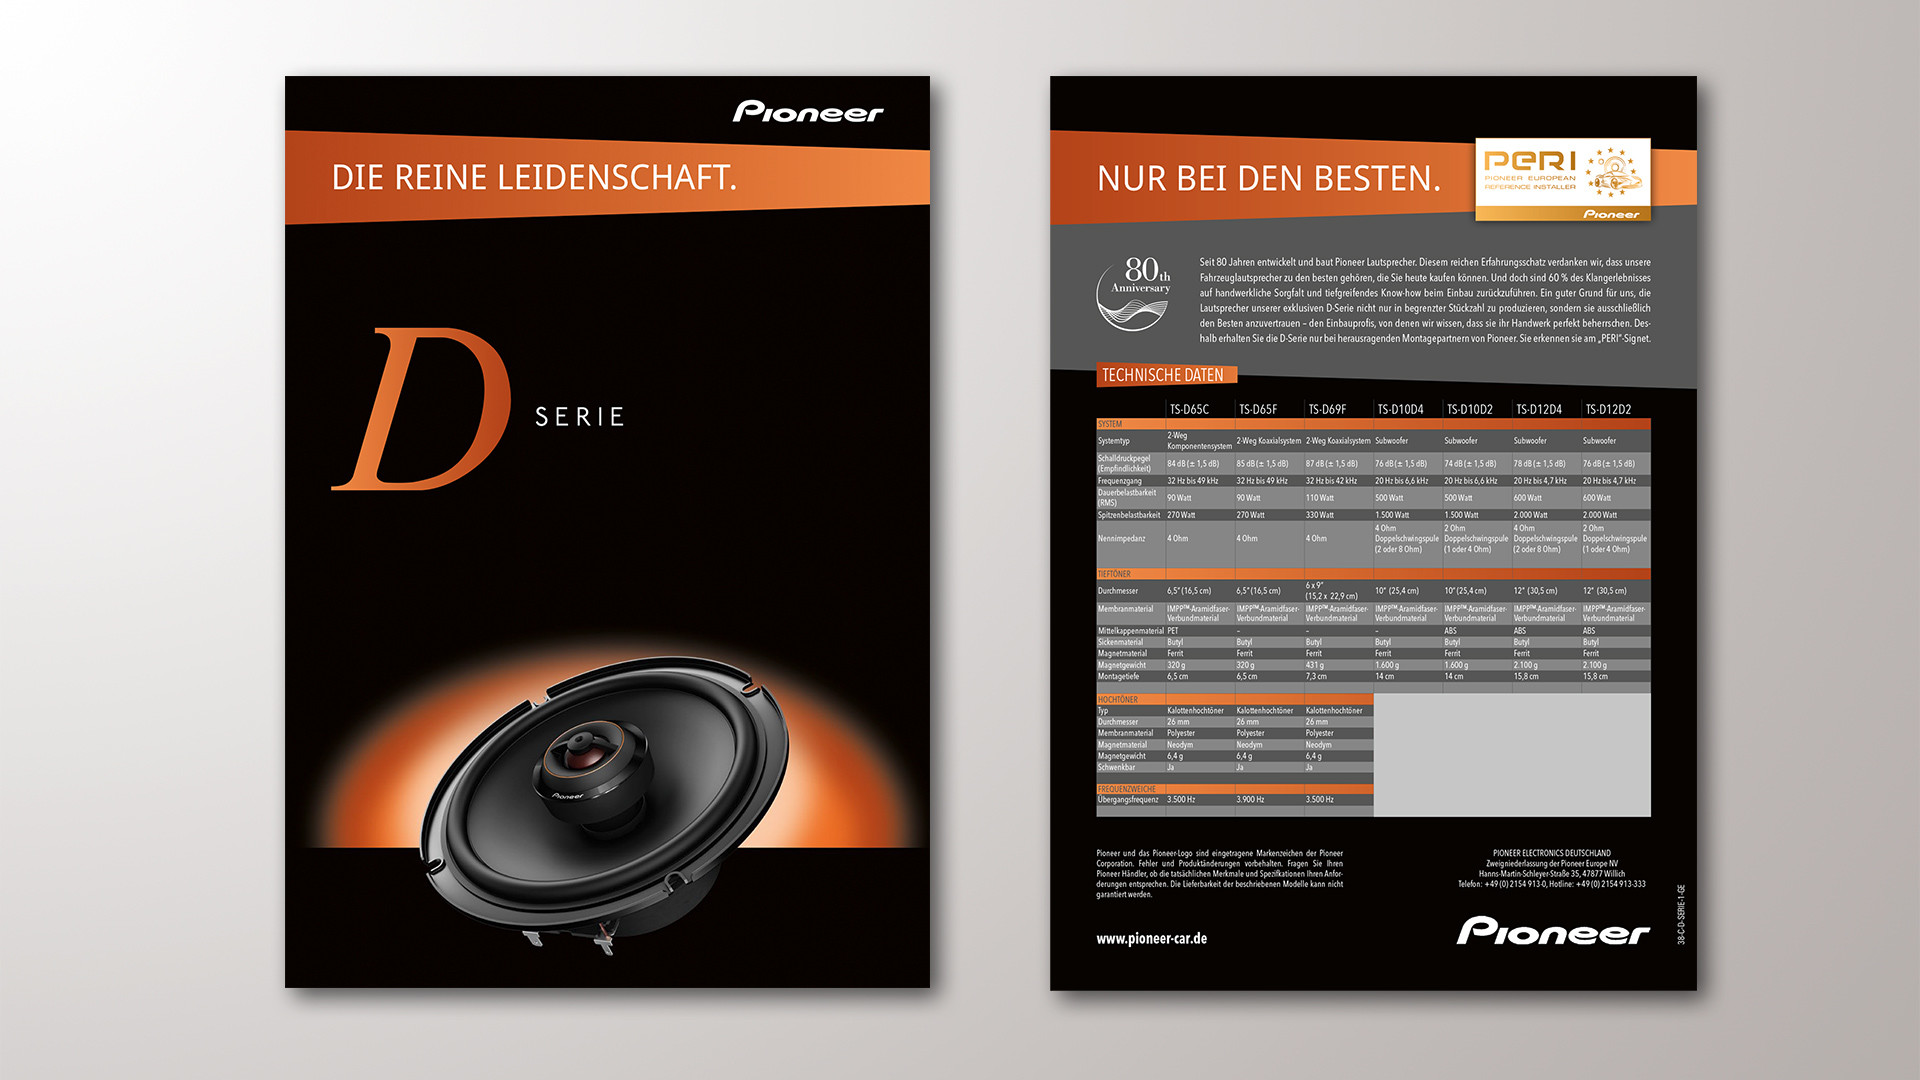 Pioneer-Prospekt_D-Serie_01